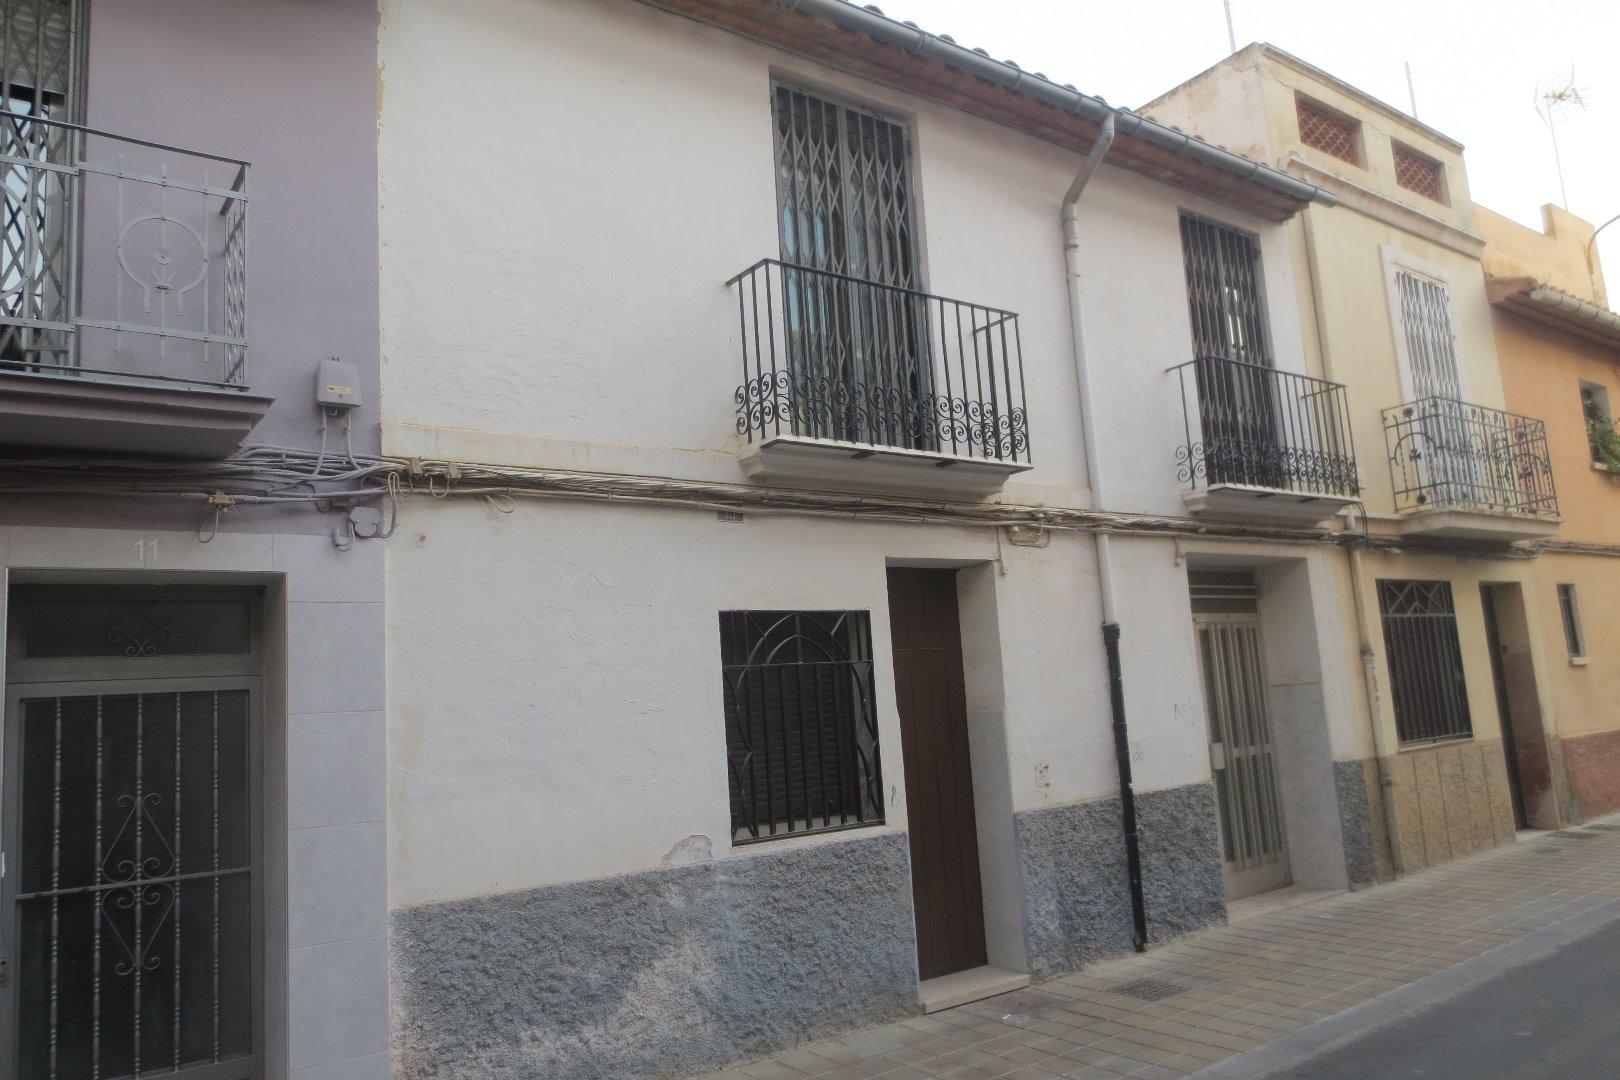 Haus oder Chalet zum verkauf in Calle Vázquez de Mella, 13, Castellón de la Plana ciudad